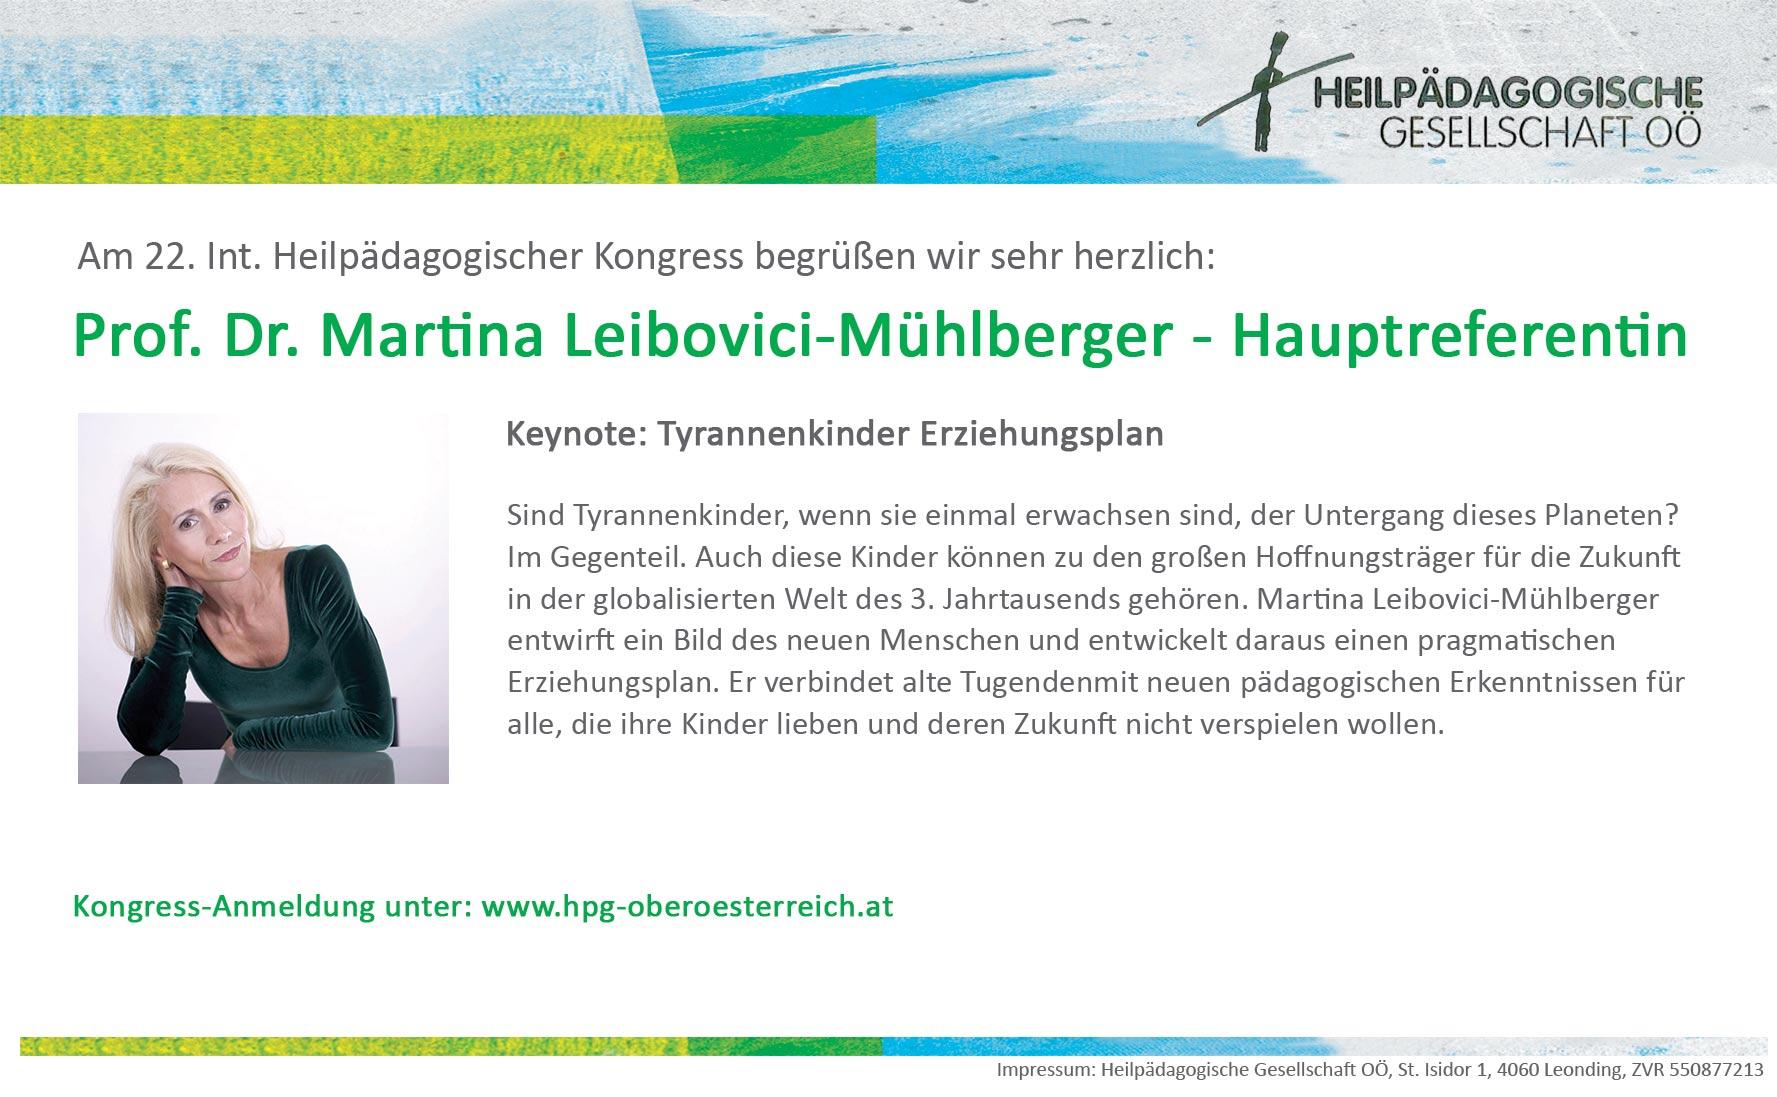 Martina Leibovici Mühlberger